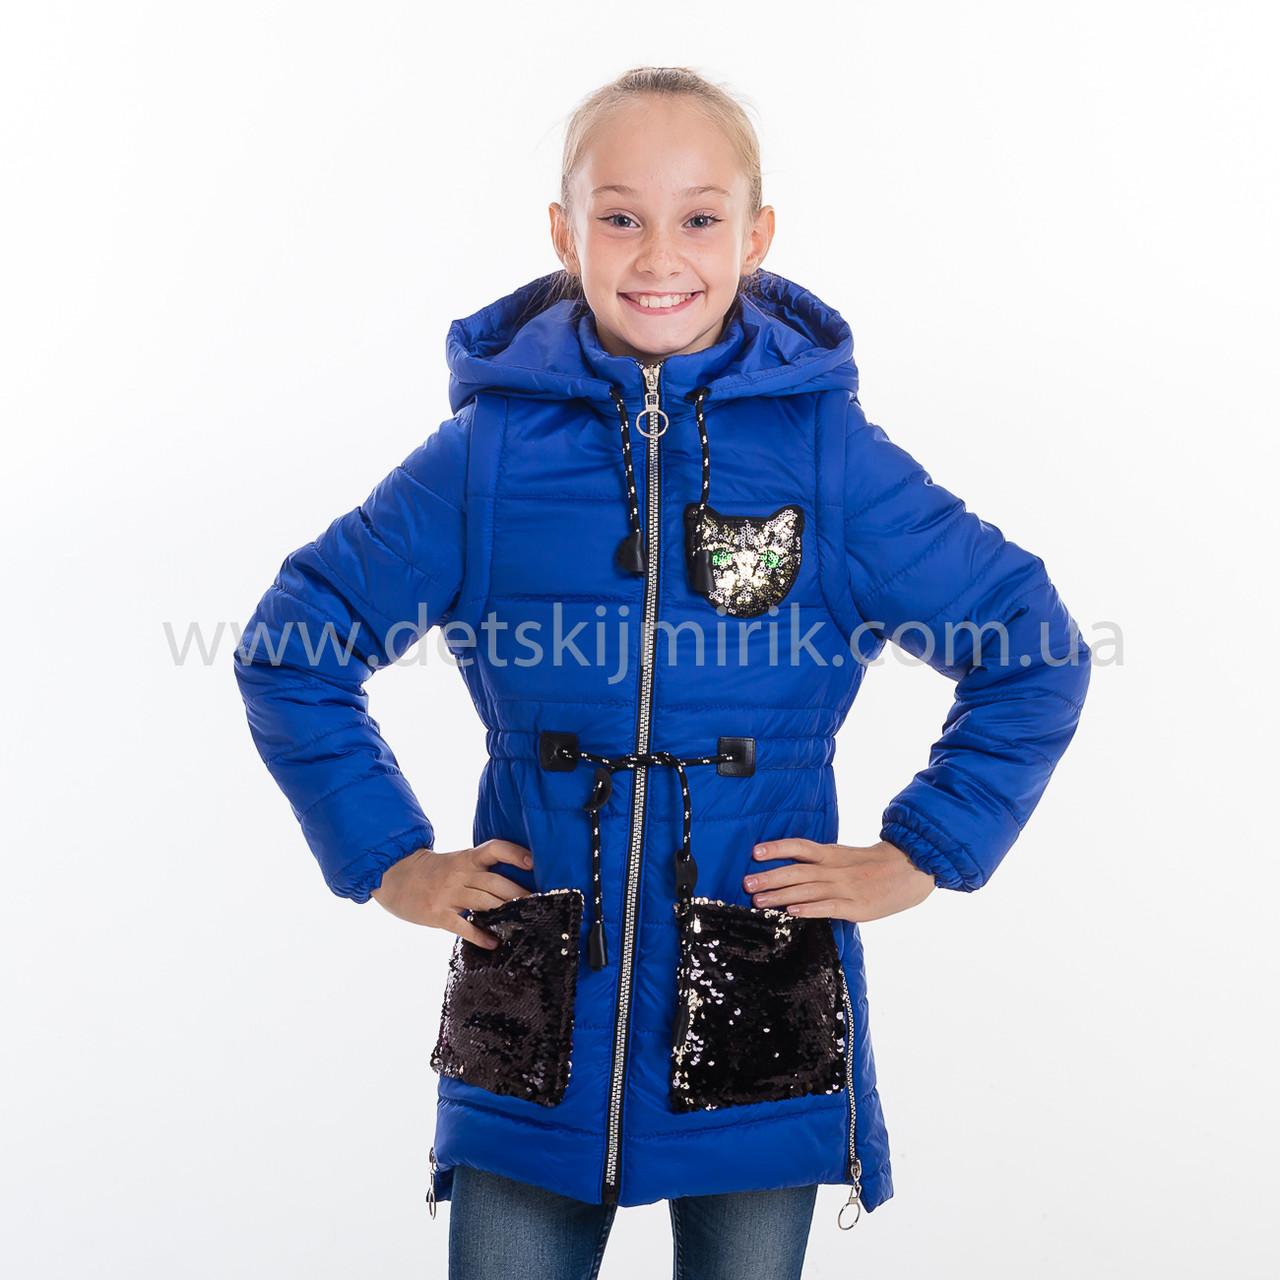 e5f51260fca Демисезонная куртка-жилет для девочки